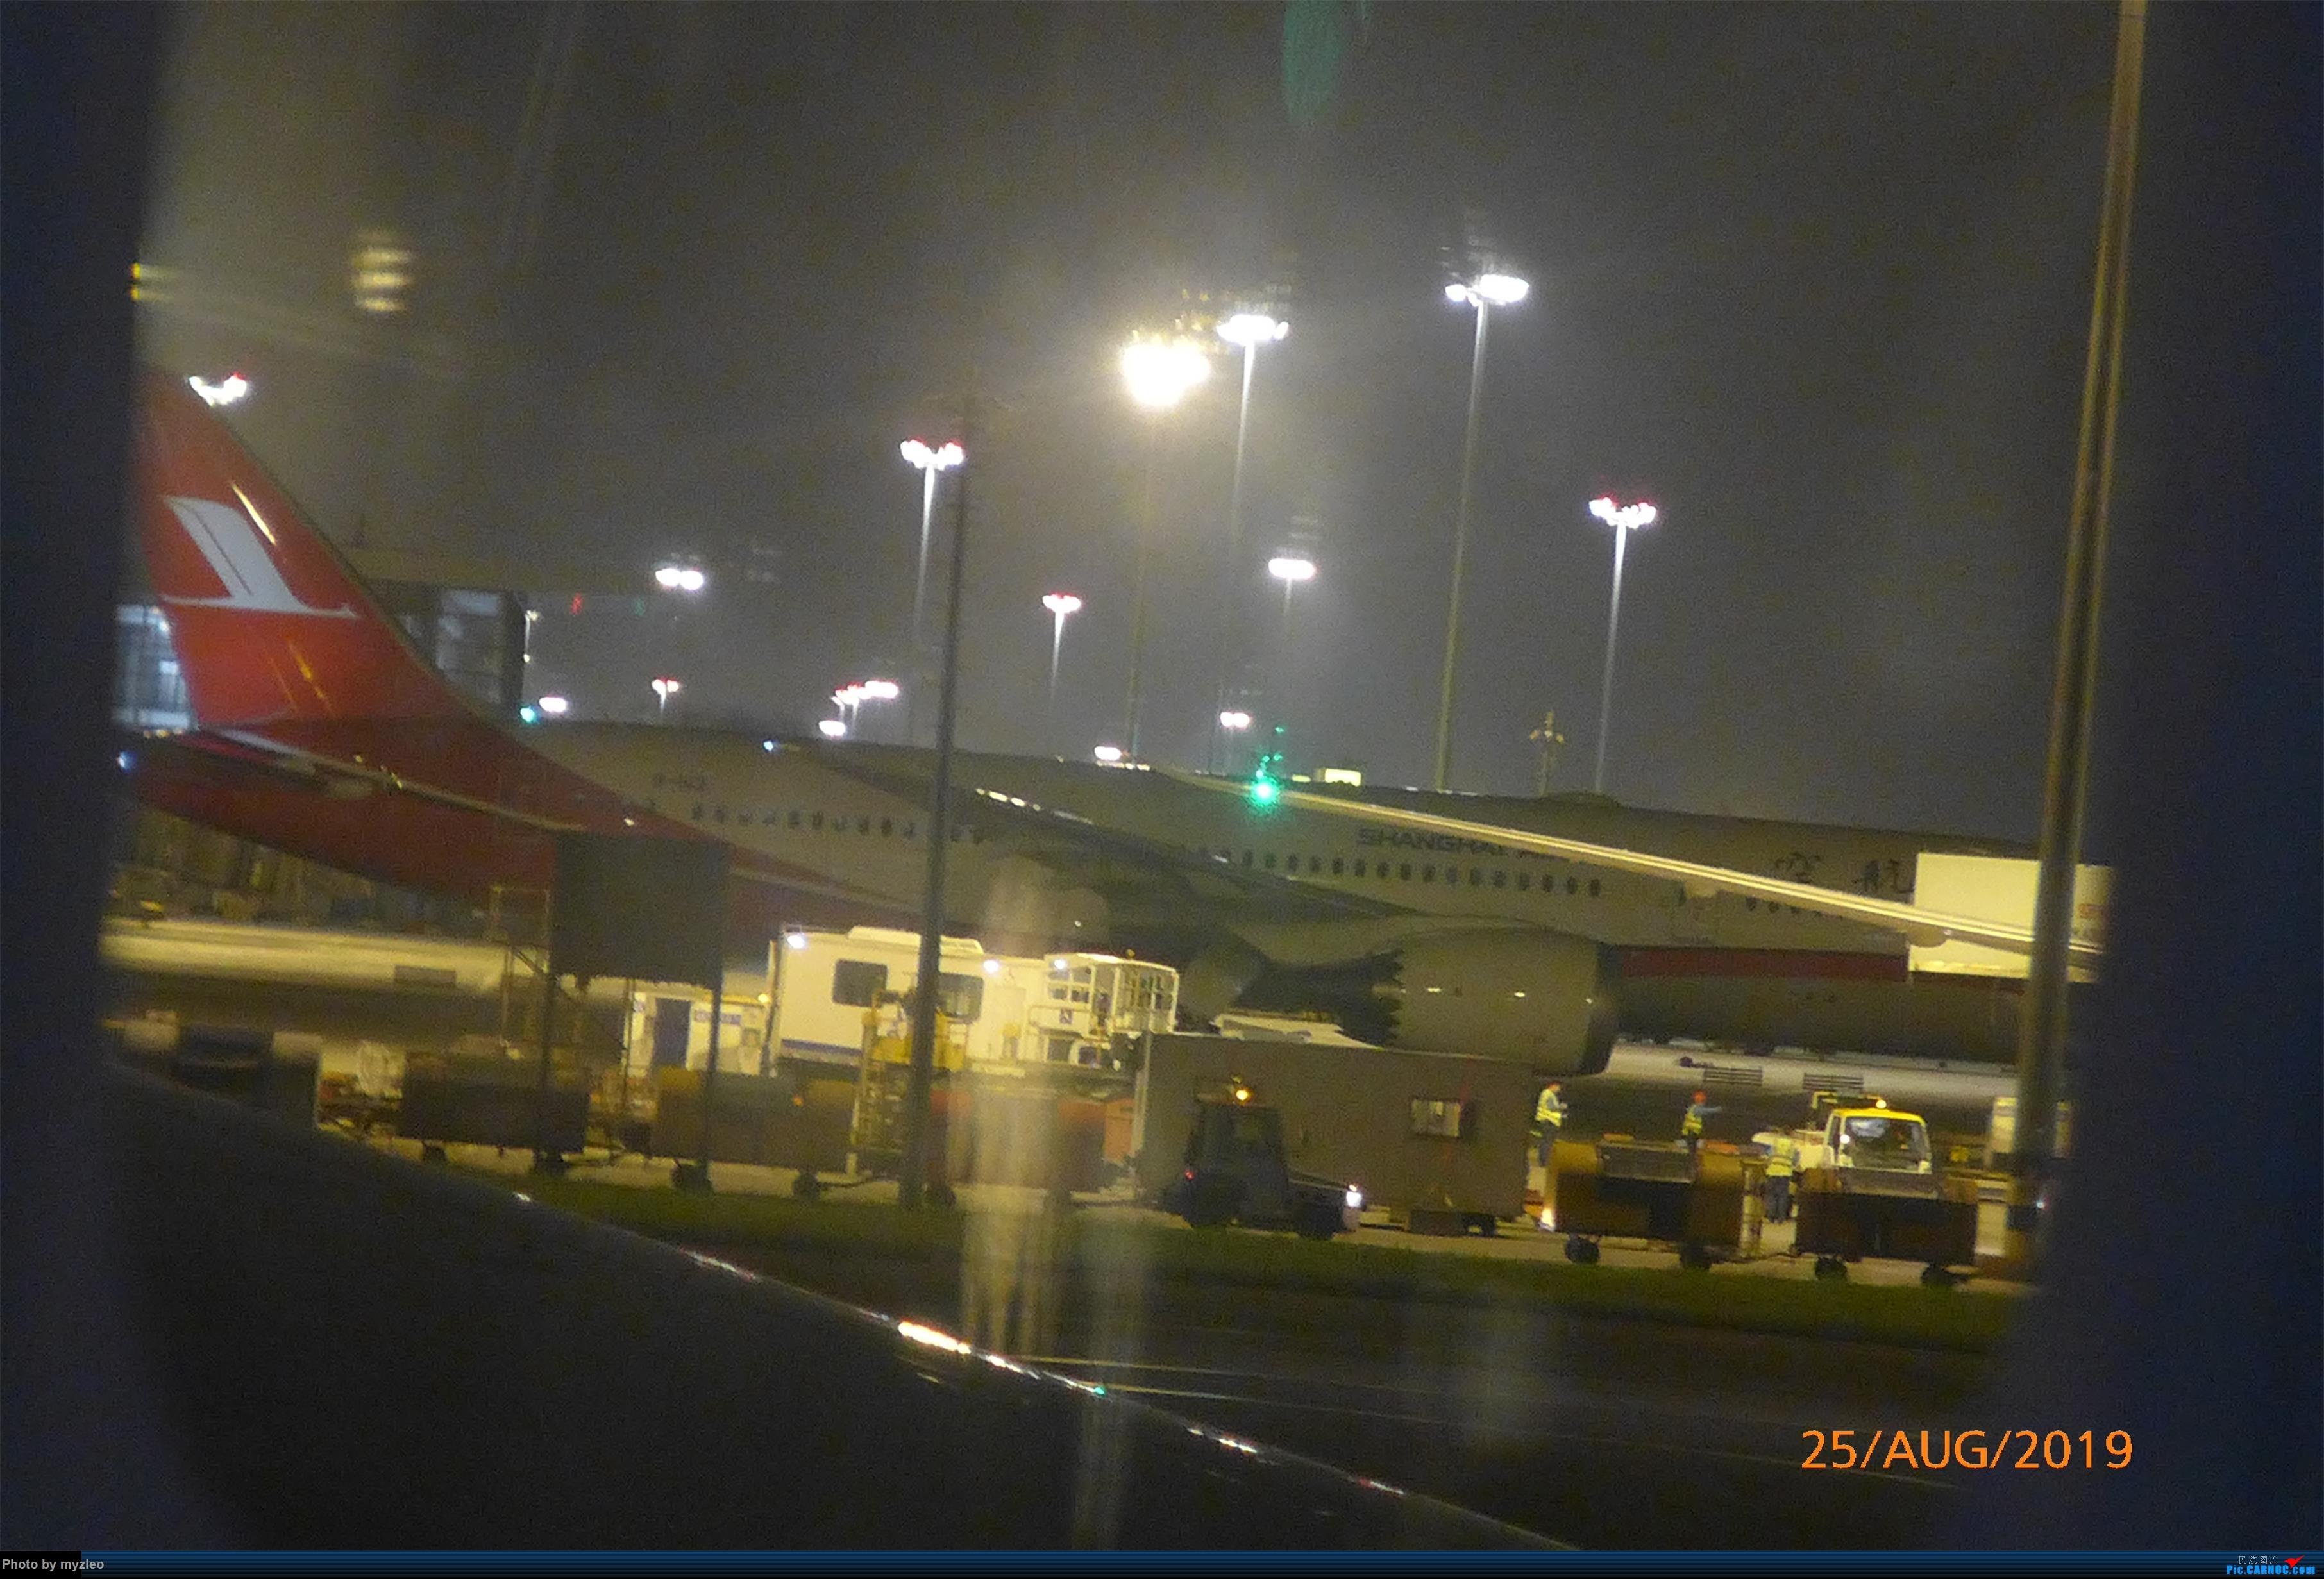 Re:[原创]【myzleo的游记5.3】在大连各景点穿梭不停,坐东航319返回上海 BOEING 787-9 B-1112 中国上海浦东国际机场